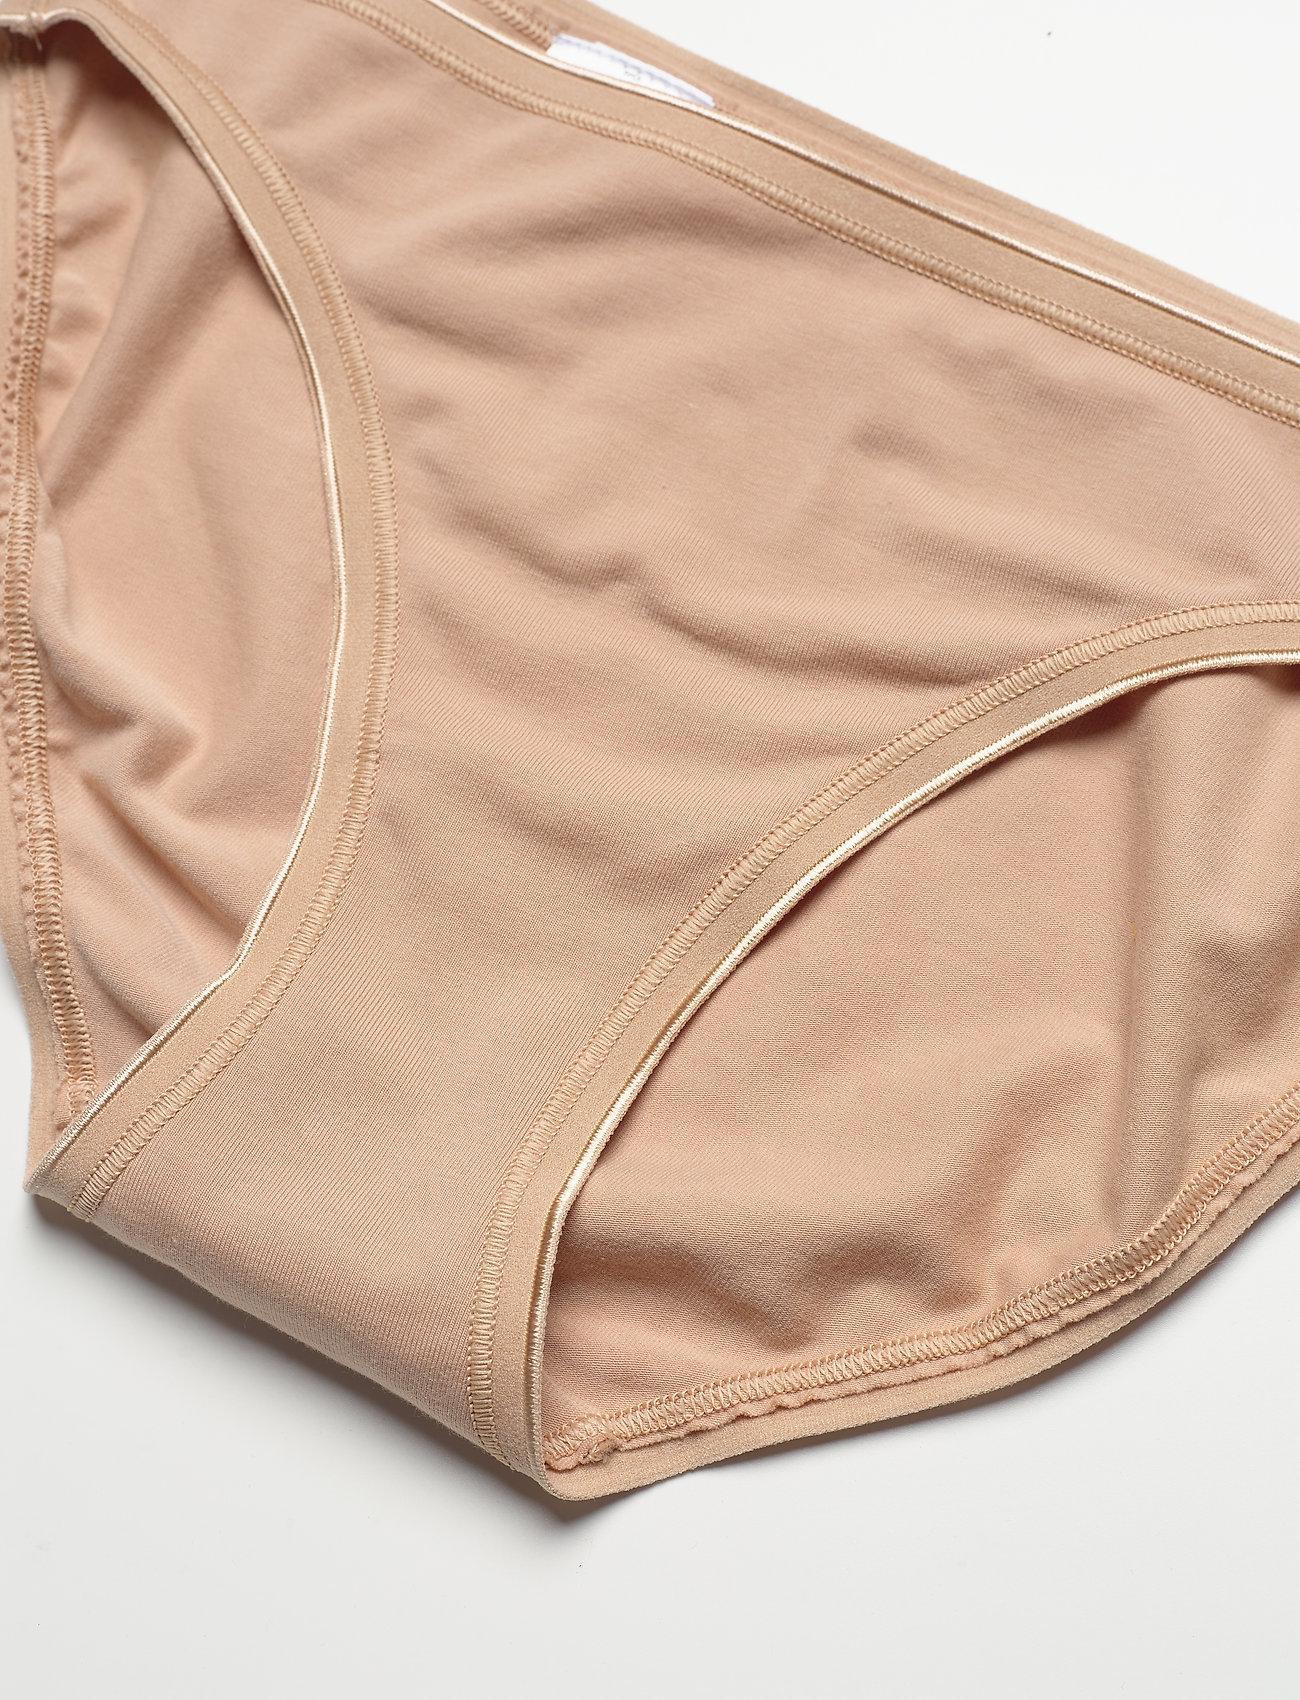 GAP Stretch Cotton Bikini- Culottes et bas g794vXfW bOBFw qqqITyzi